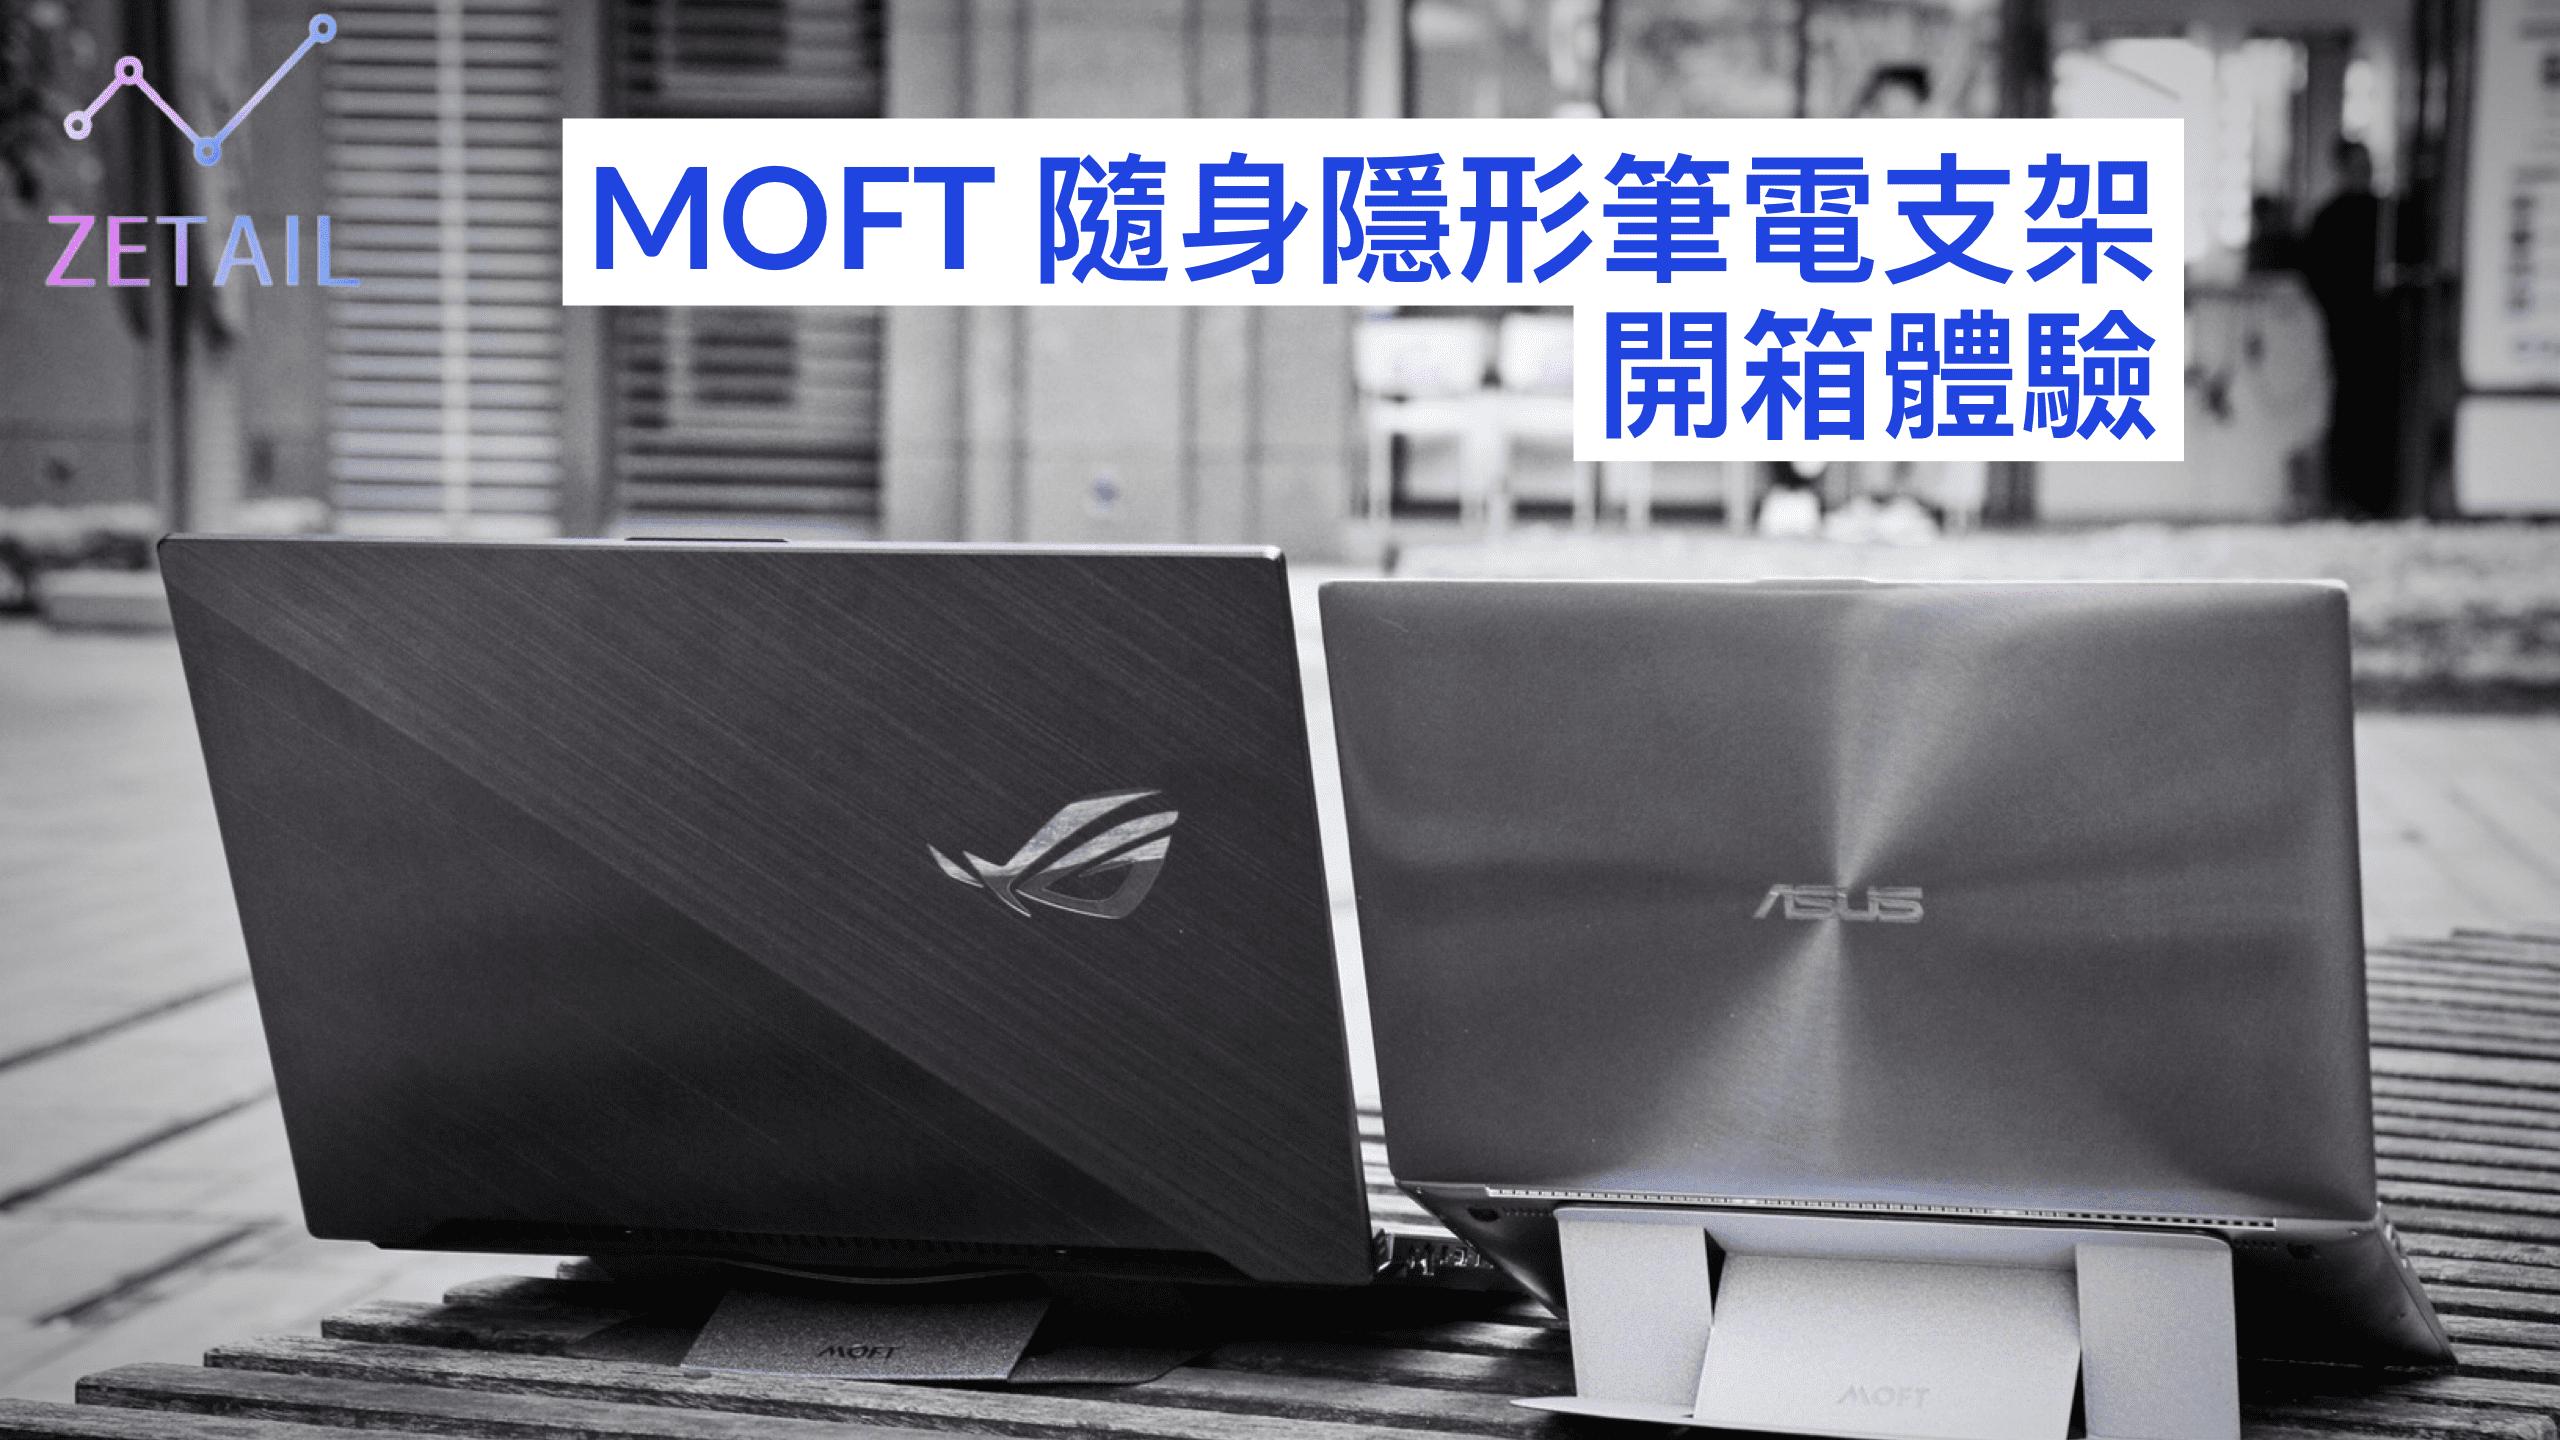 MOFT 隨身隱形筆電支架 開箱體驗:輕薄一貼,撐起你的視野